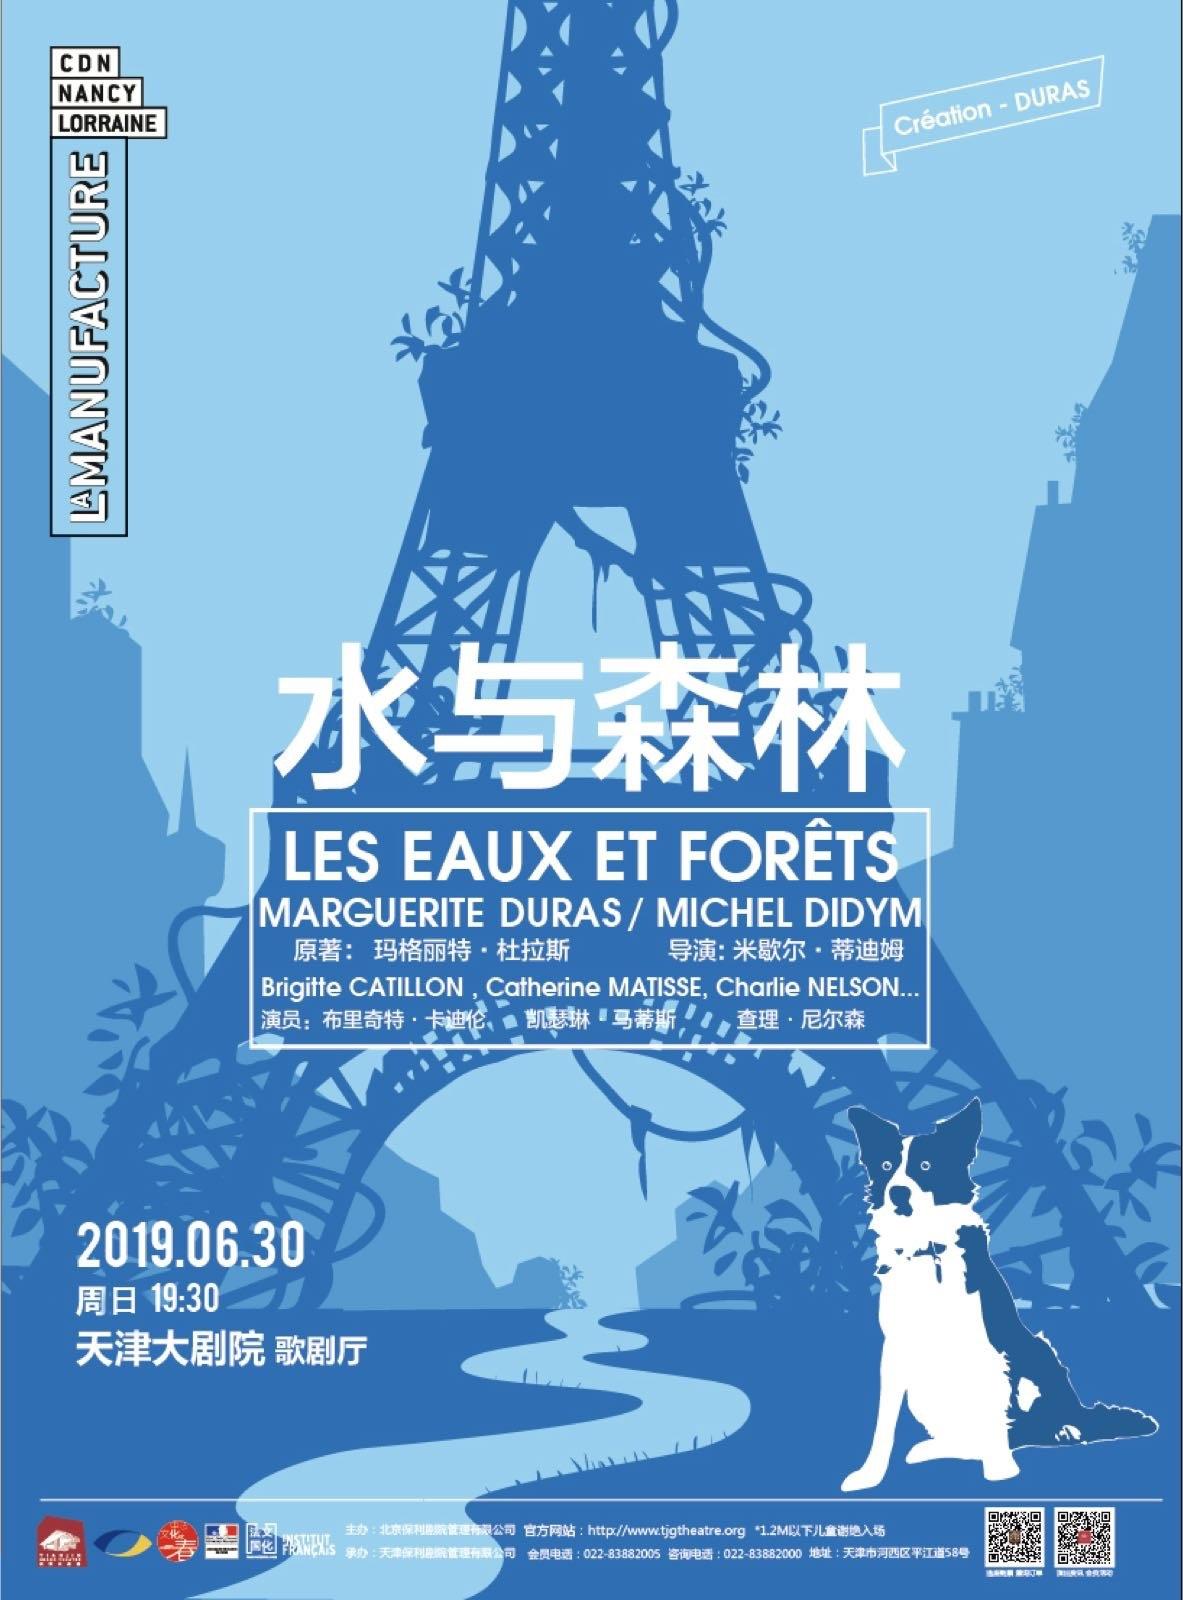 Les Eaux et Forêts Water and Forest